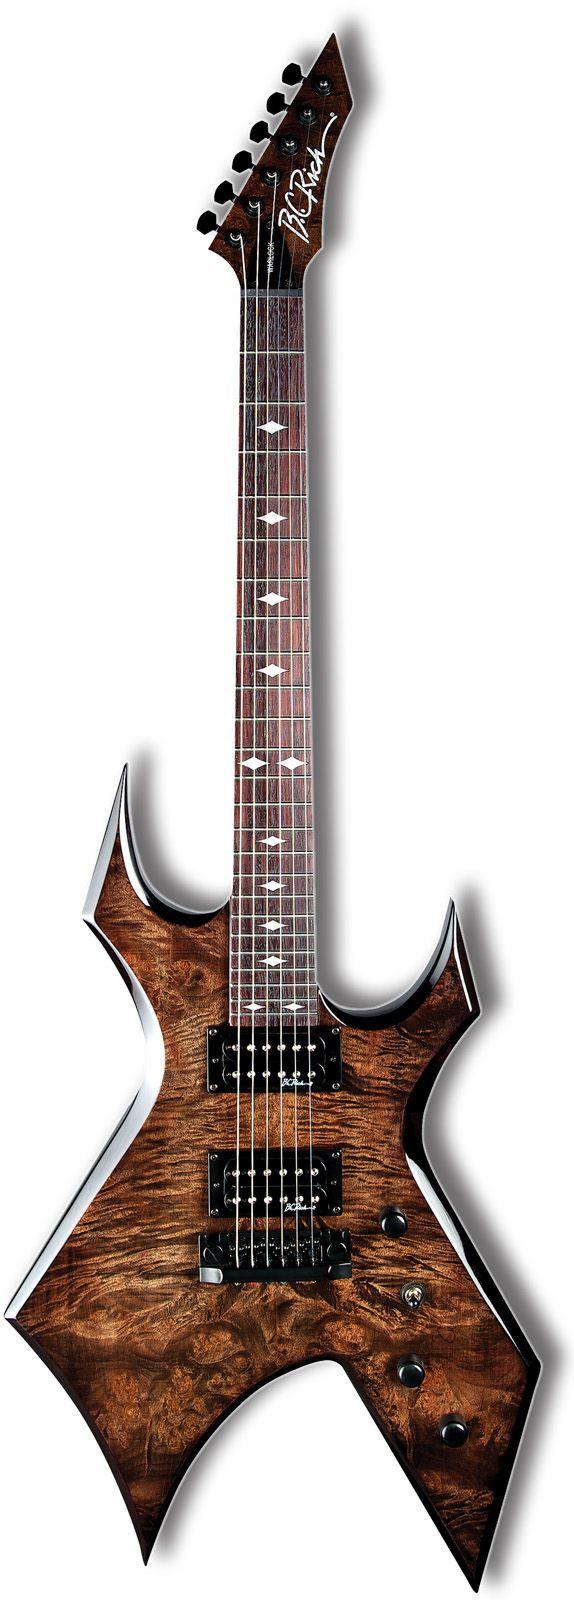 B C Rich Warlock Plus In Black Vapor Guitarra Electrica Guitarras